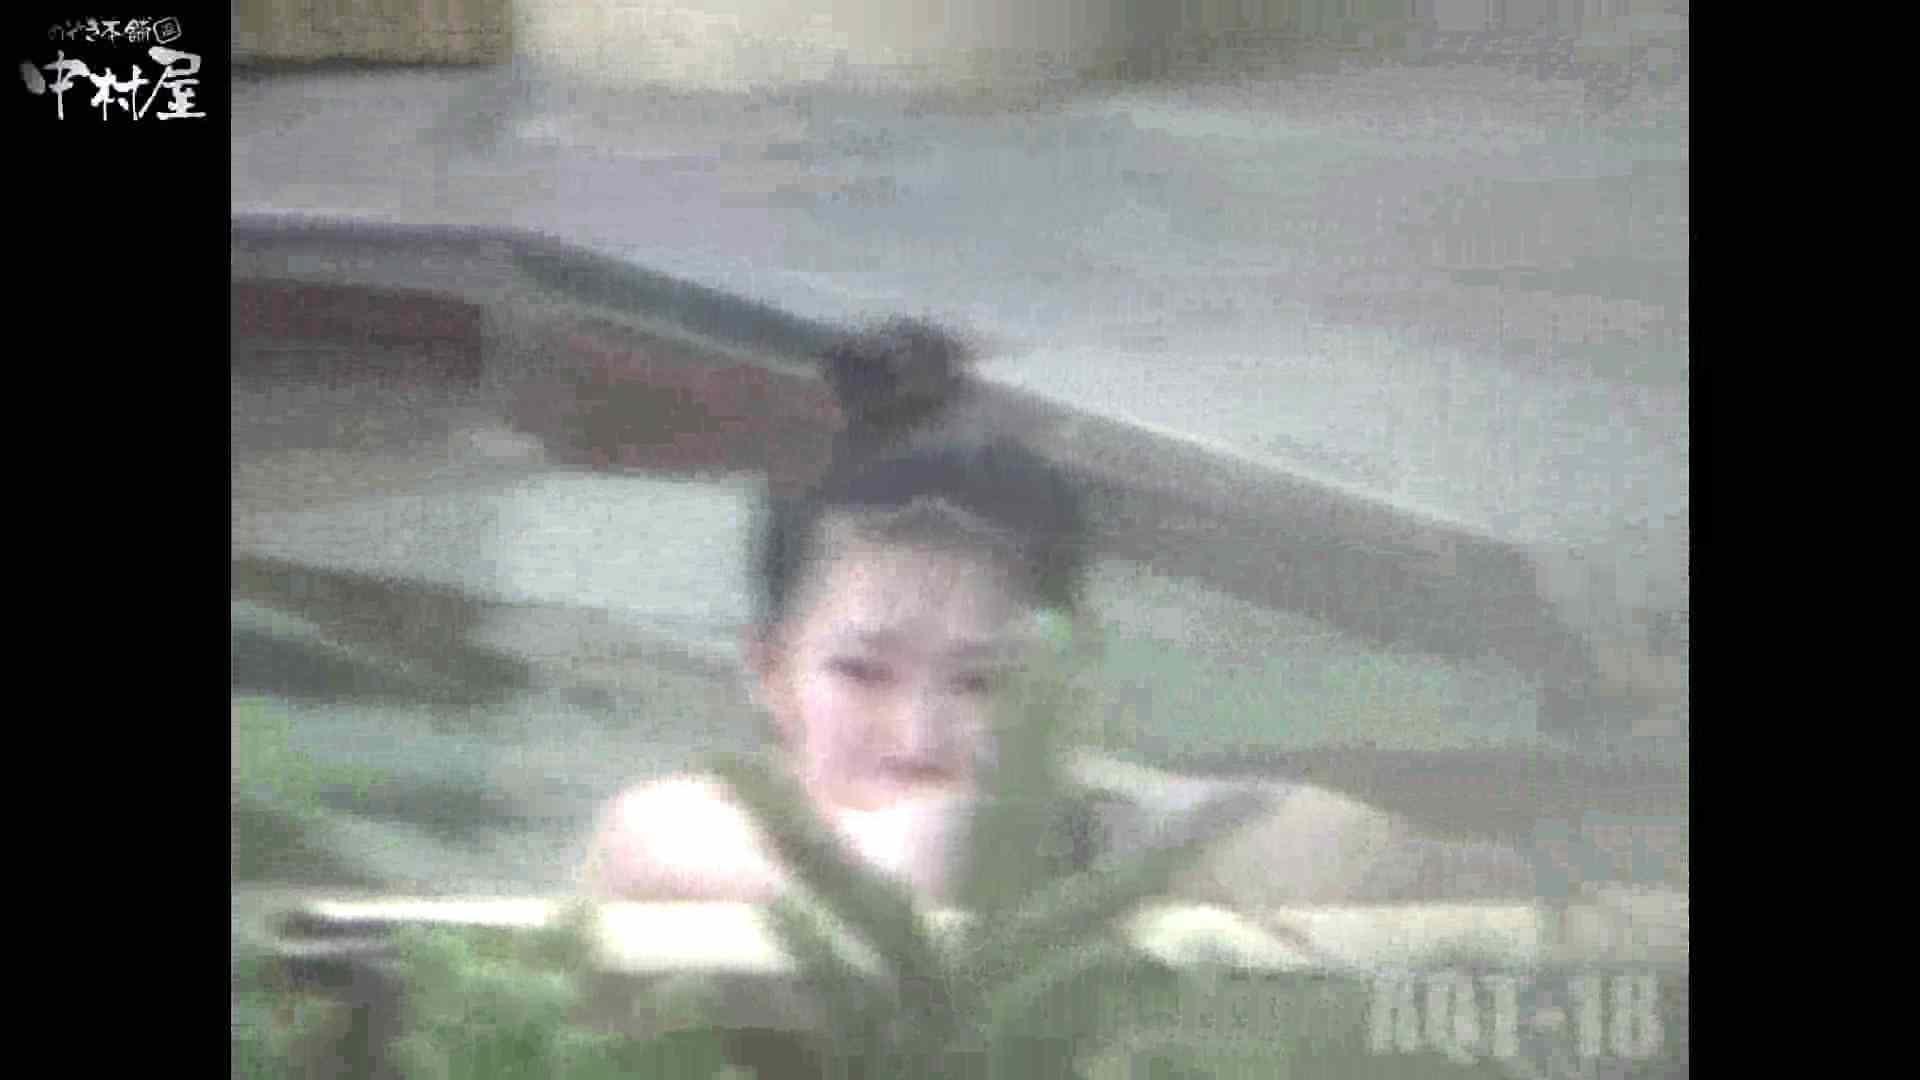 Aquaな露天風呂Vol.882潜入盗撮露天風呂十八判湯 其の二 盗撮 性交動画流出 90画像 74